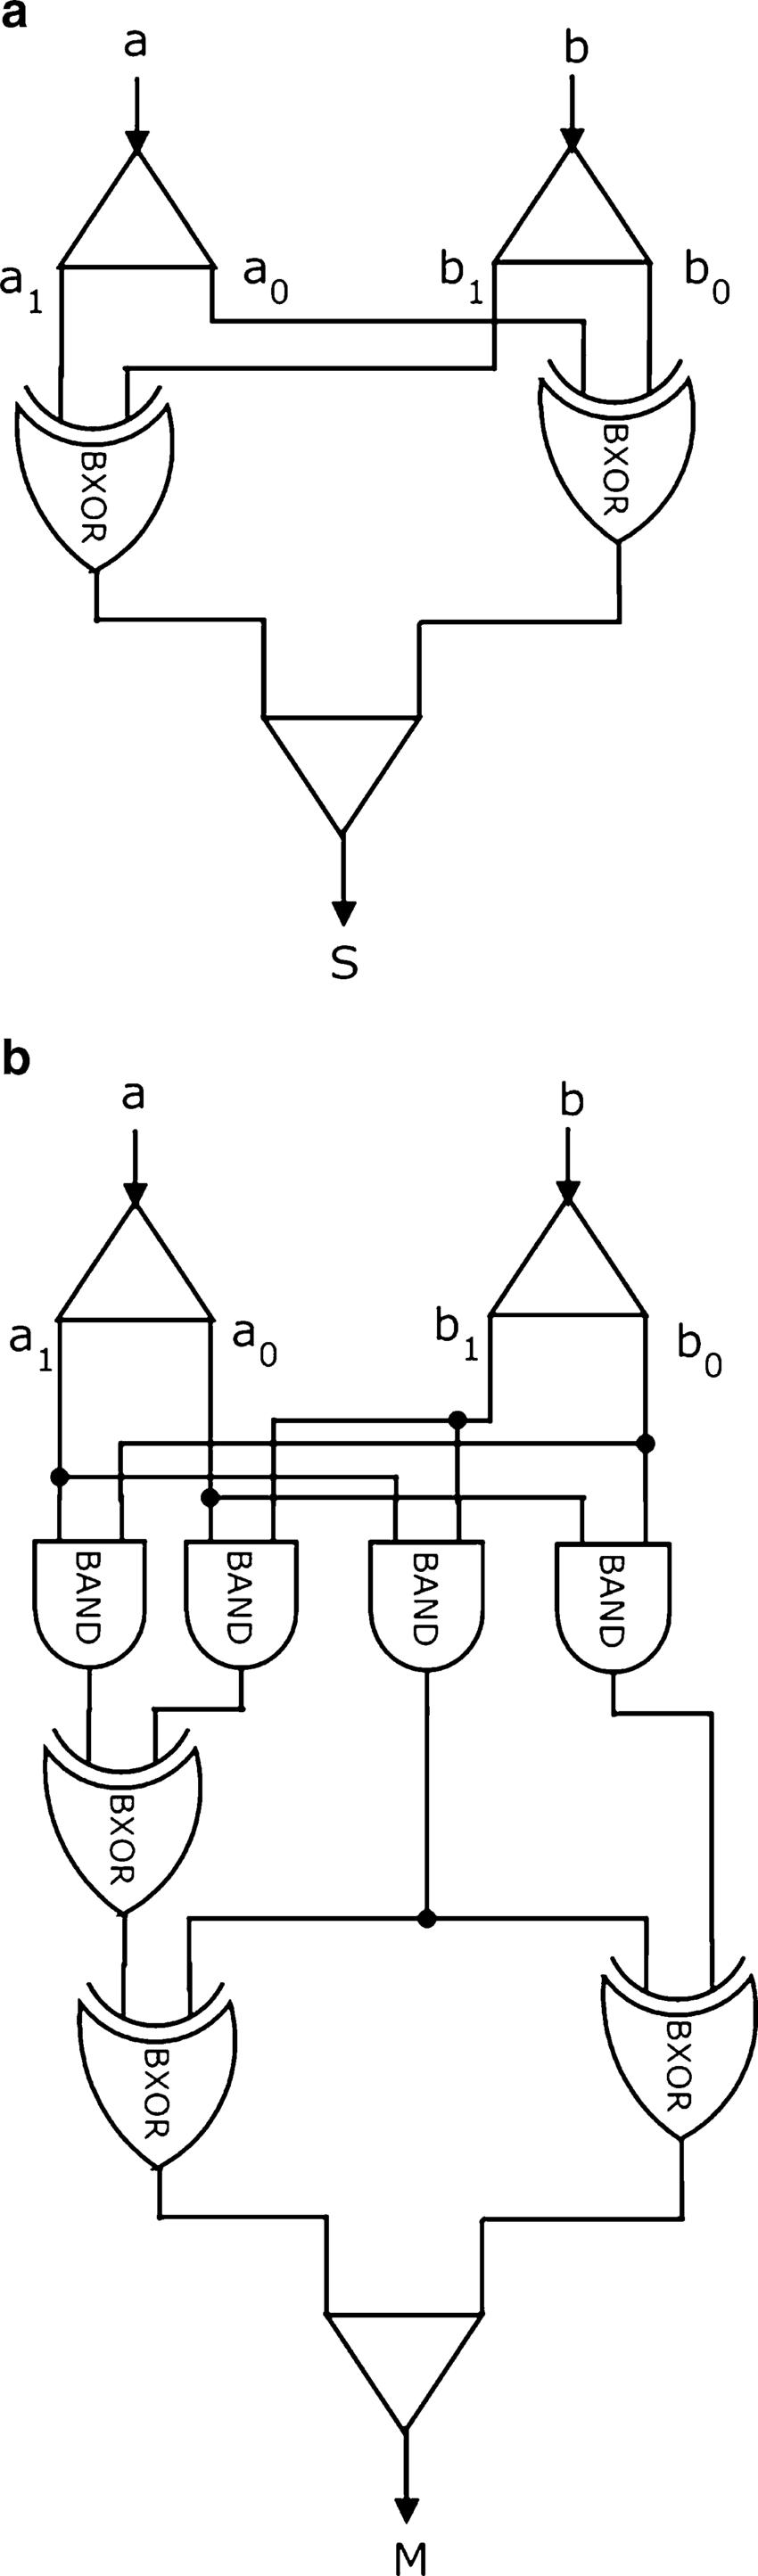 medium resolution of gf 4 a addition b multiplication circuit block diagram bxor binary xor gate